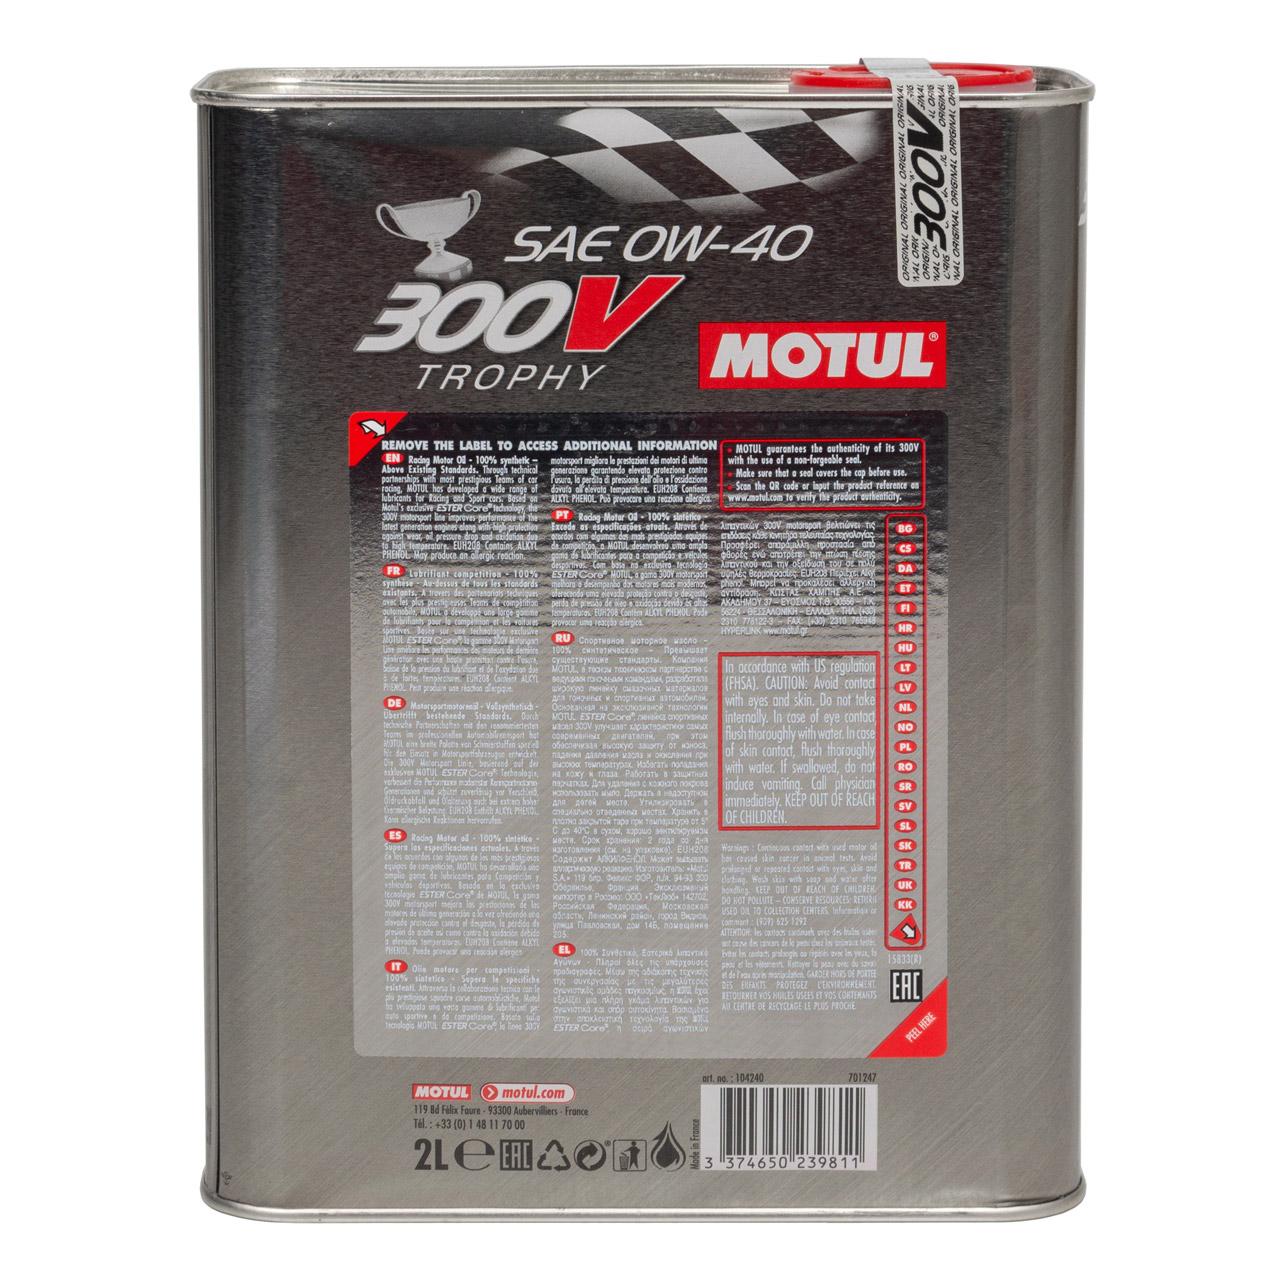 MOTUL 300V TROPHY RACING Motoröl Öl 0W40 100% Synthetic Ester Core - 2L 2 Liter